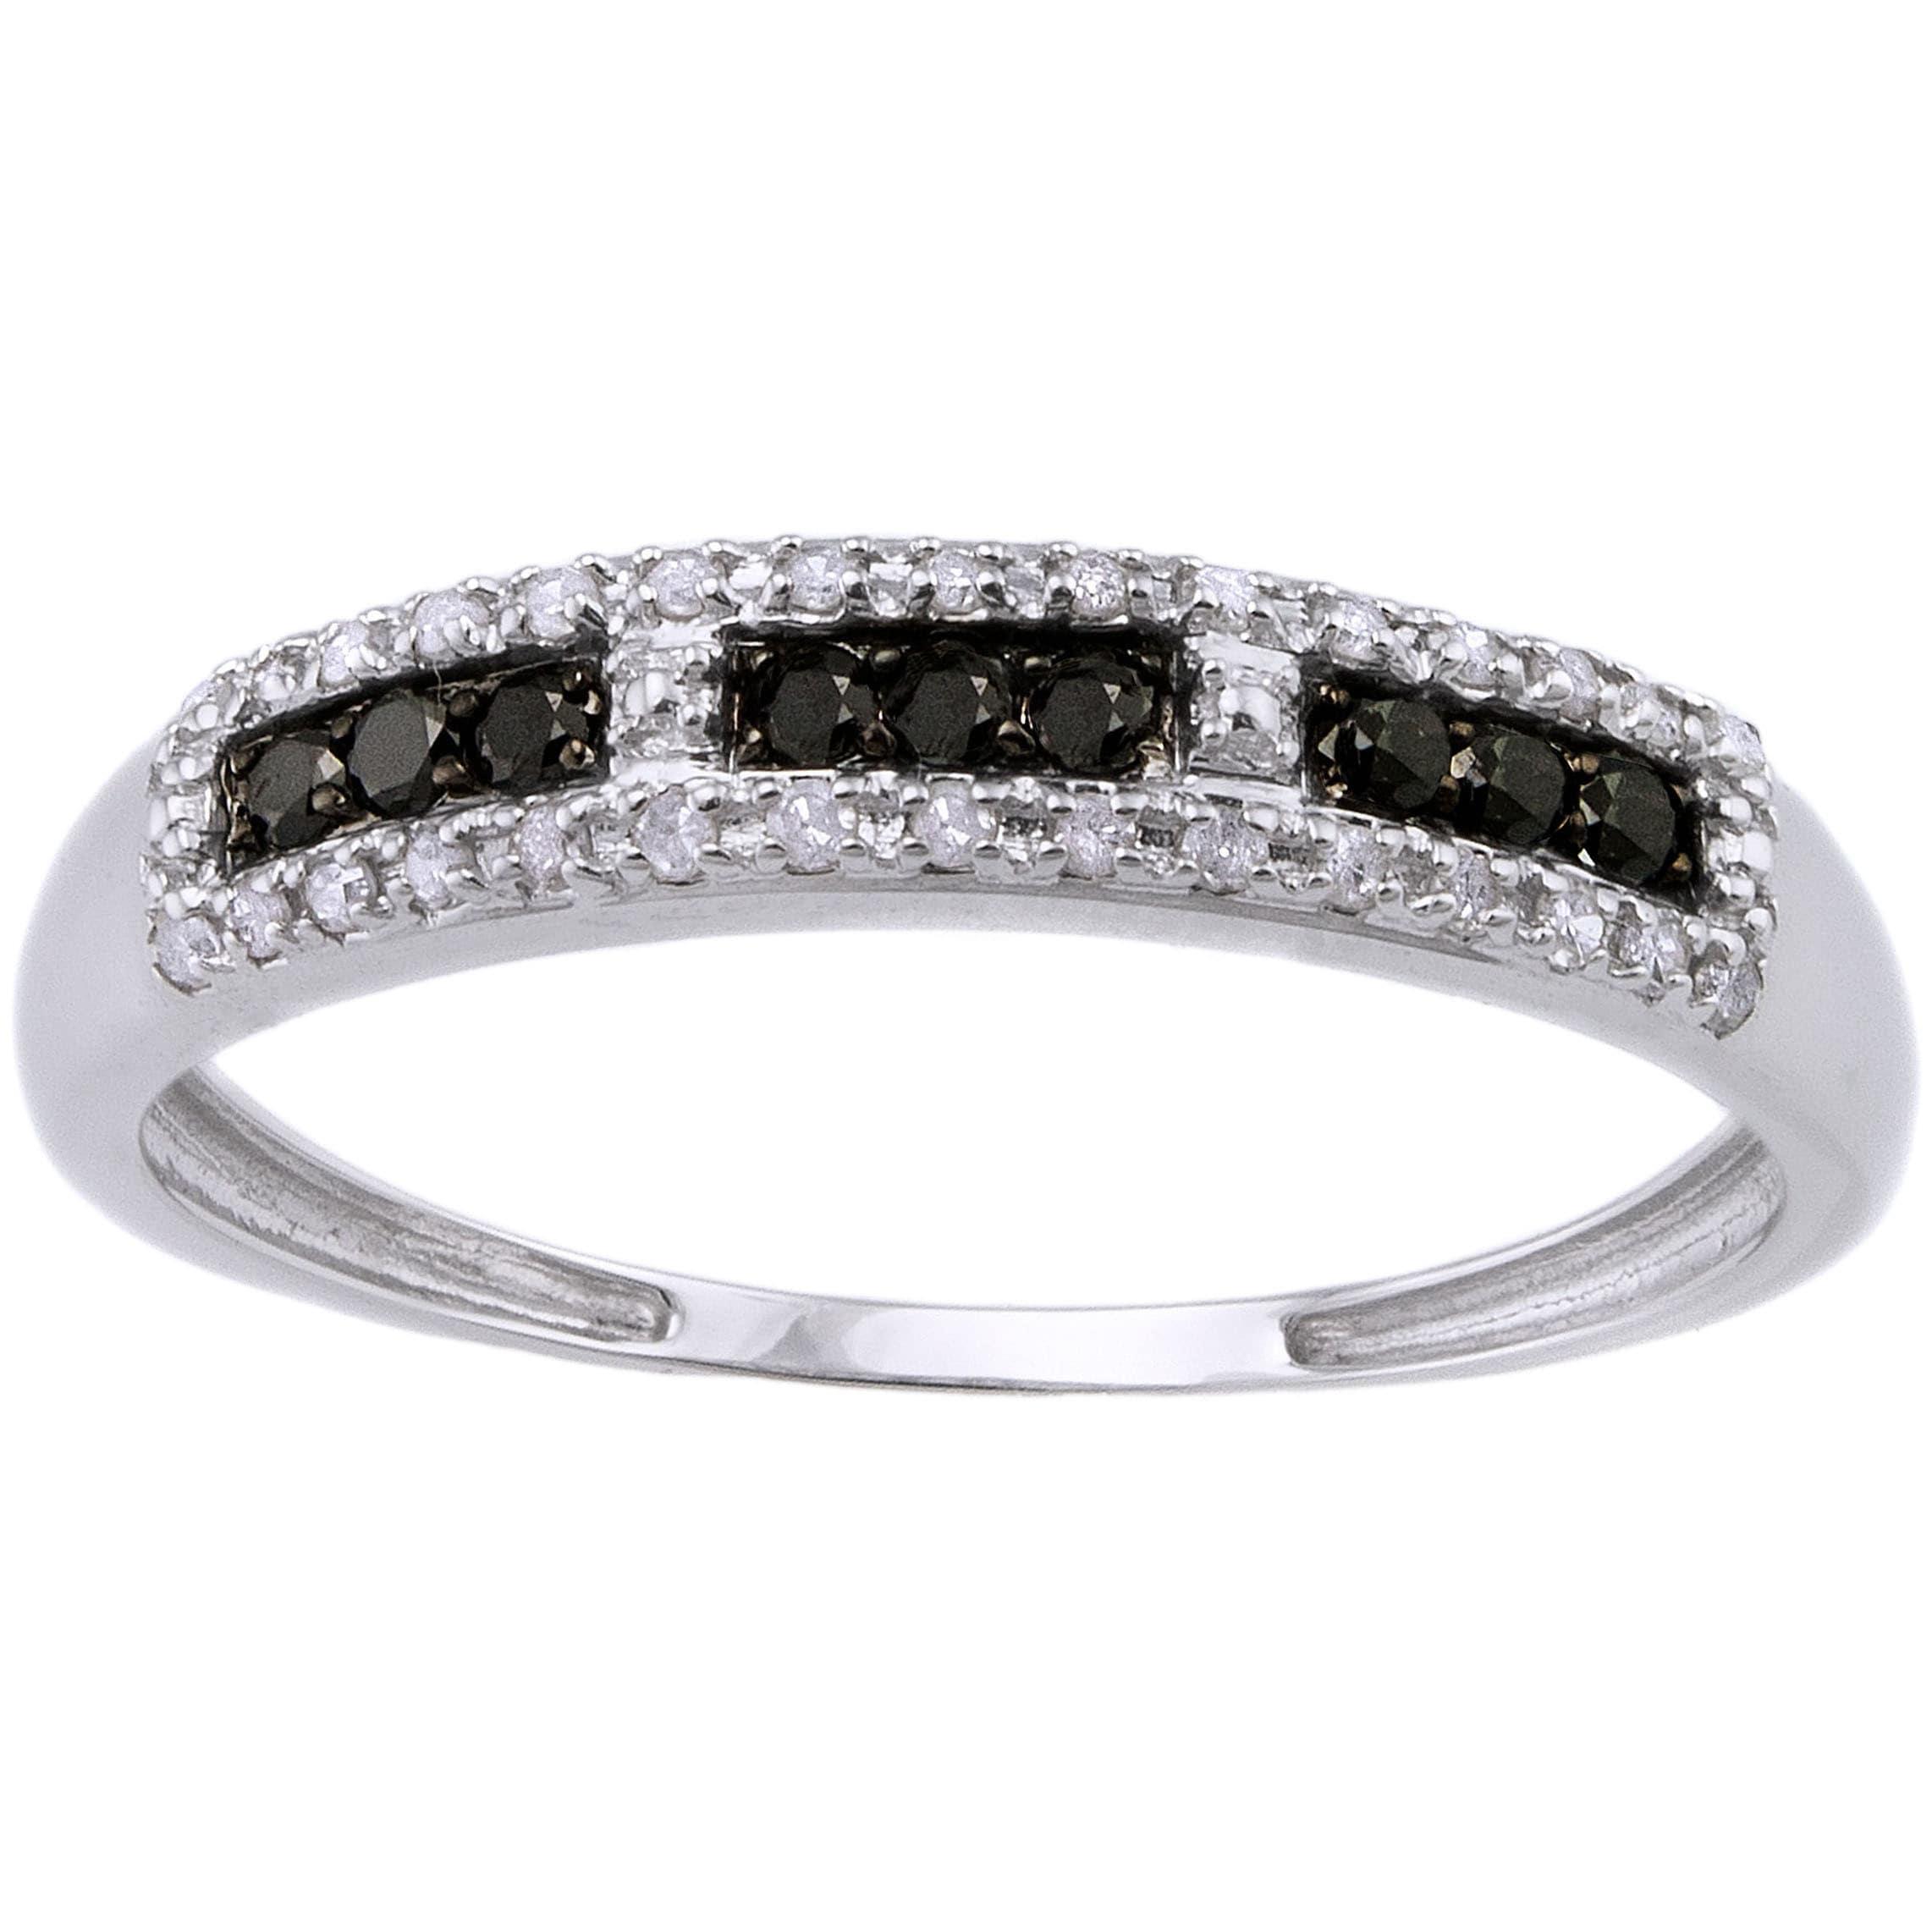 Beverly Hills Charm 10k White Gold 1/5ct TDW Black/ White Diamond Ring at Sears.com